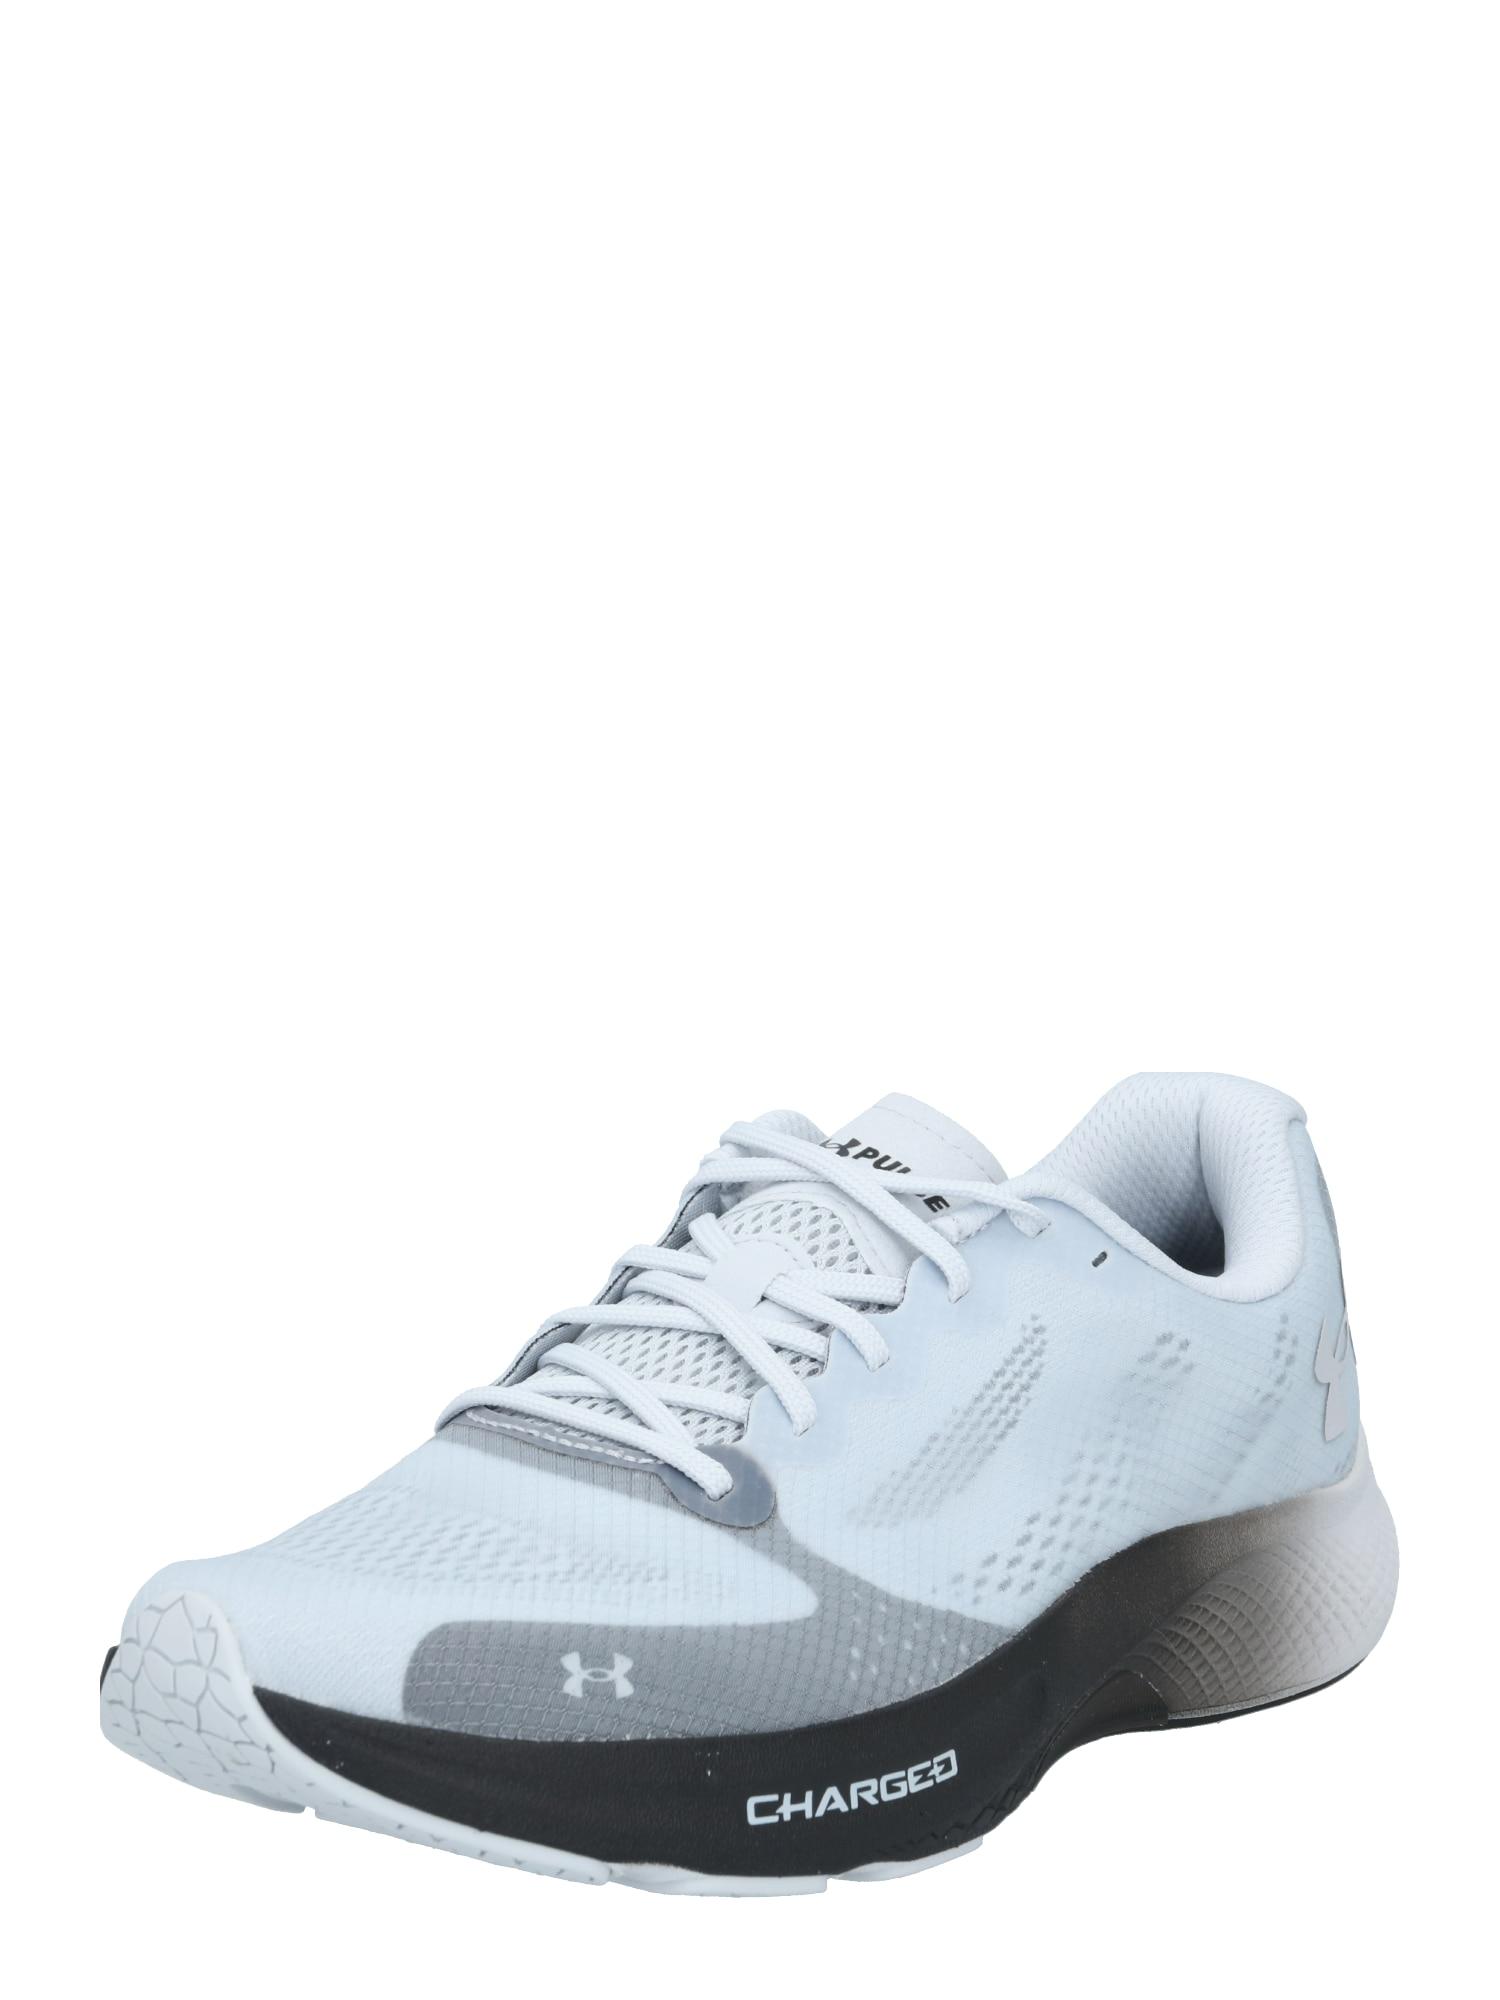 UNDER ARMOUR Bėgimo batai pilka / tamsiai pilka